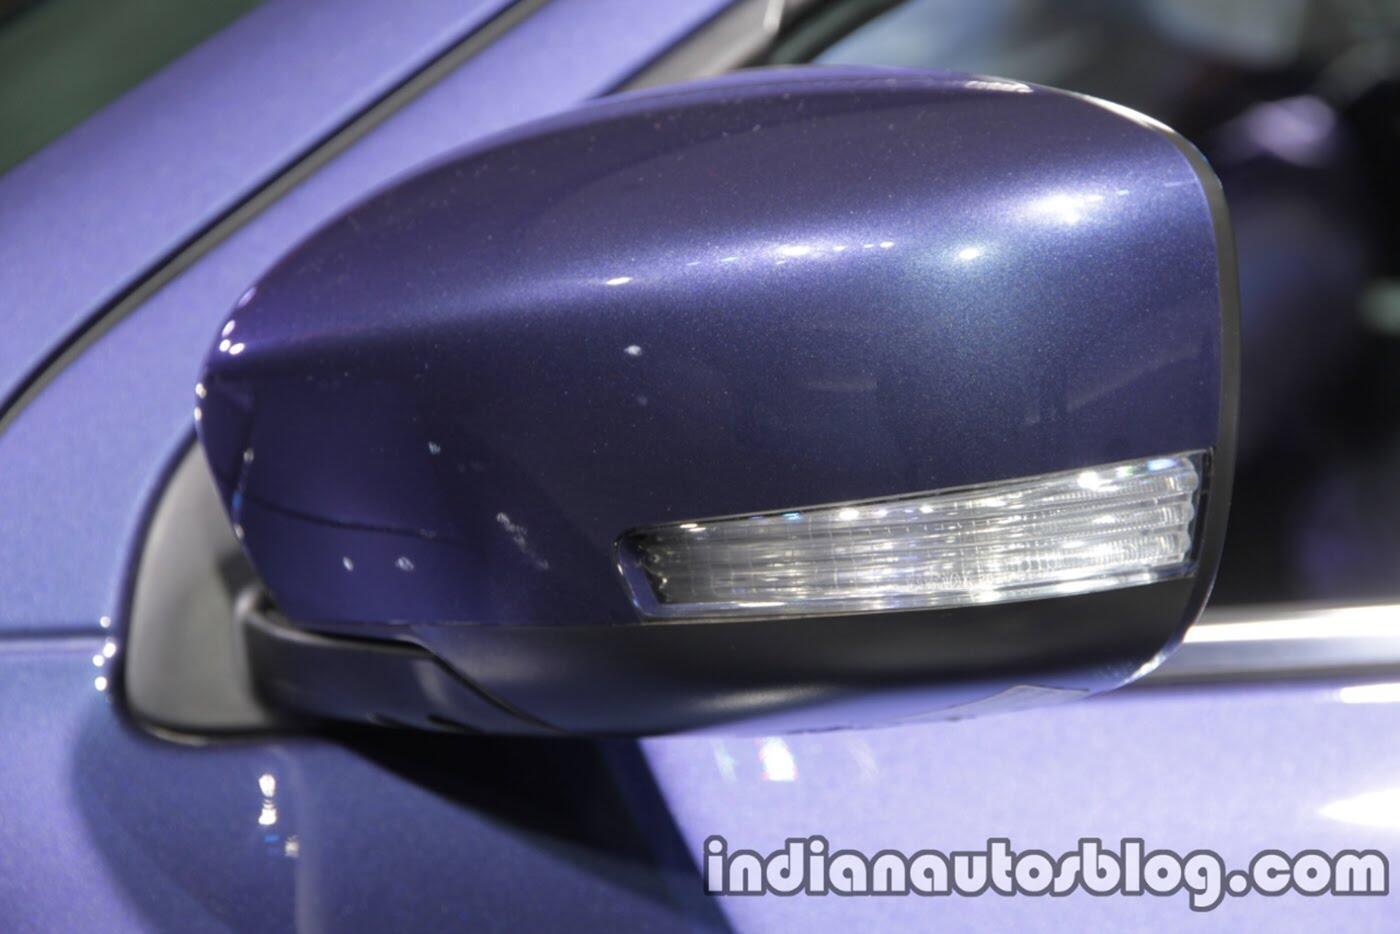 Xem thêm ảnh phiên bản sedan của Suzuki Swift 2018 - Hình 3